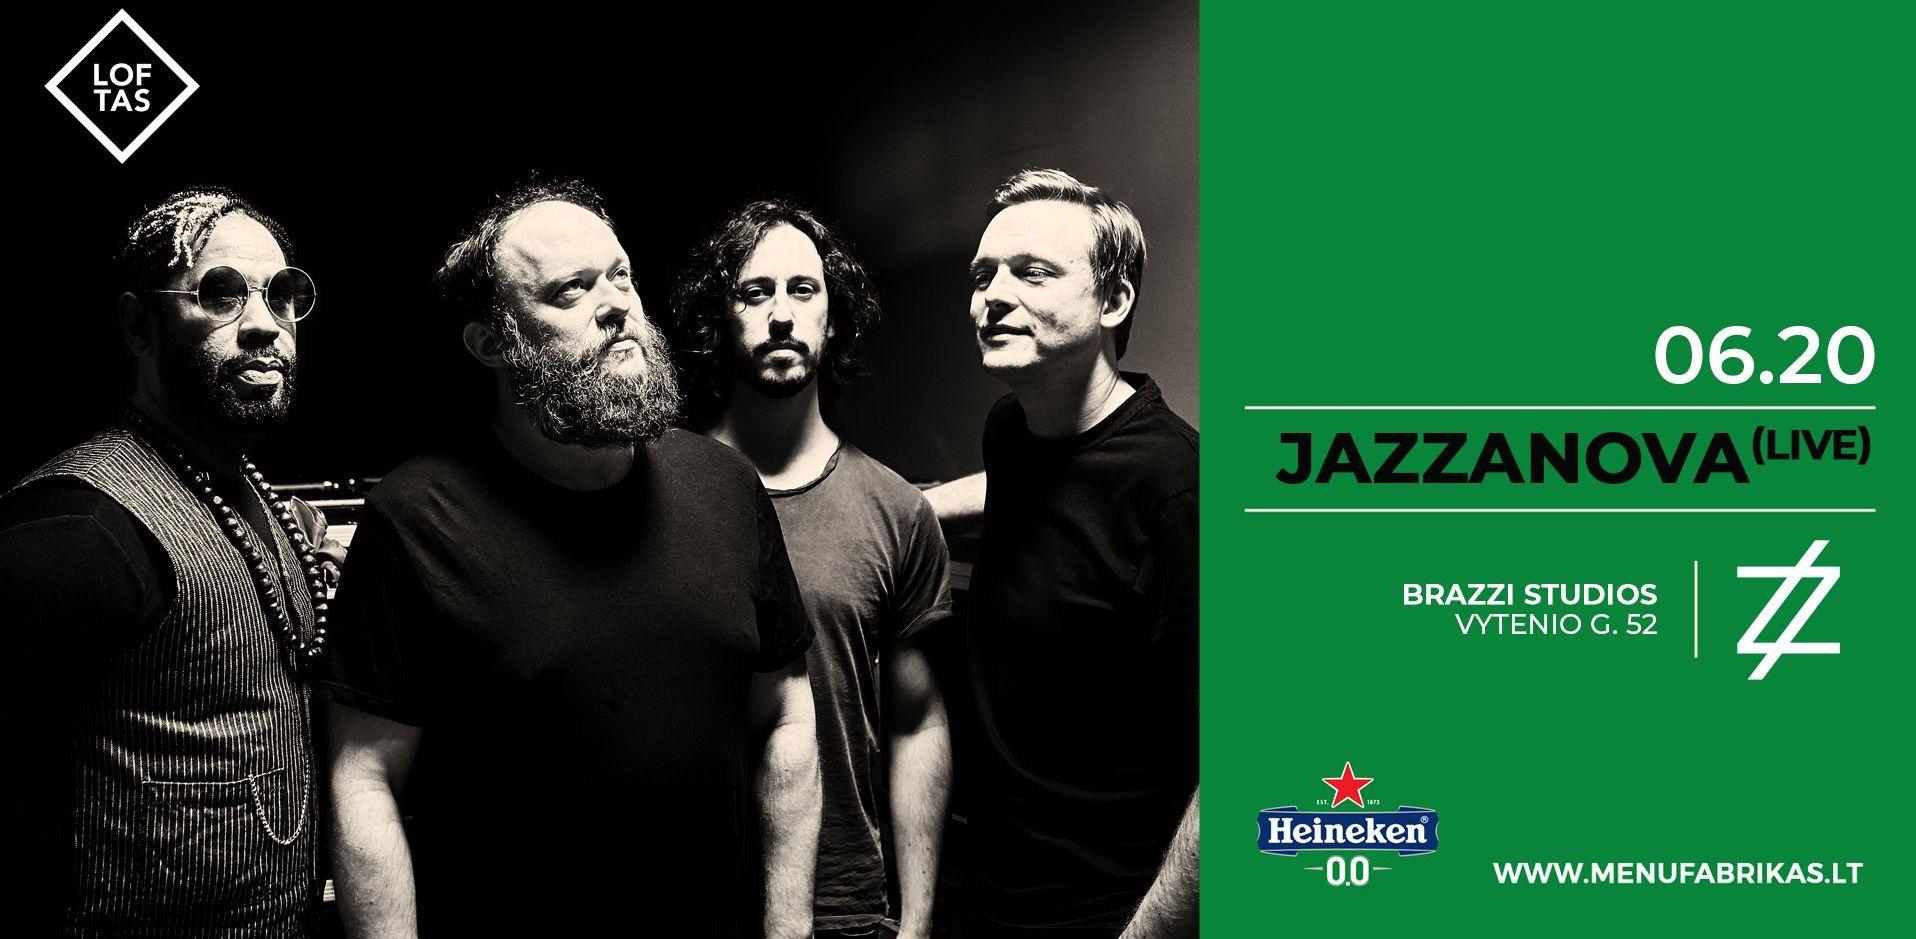 Birželį Vilniuje – Jazzanova koncertas